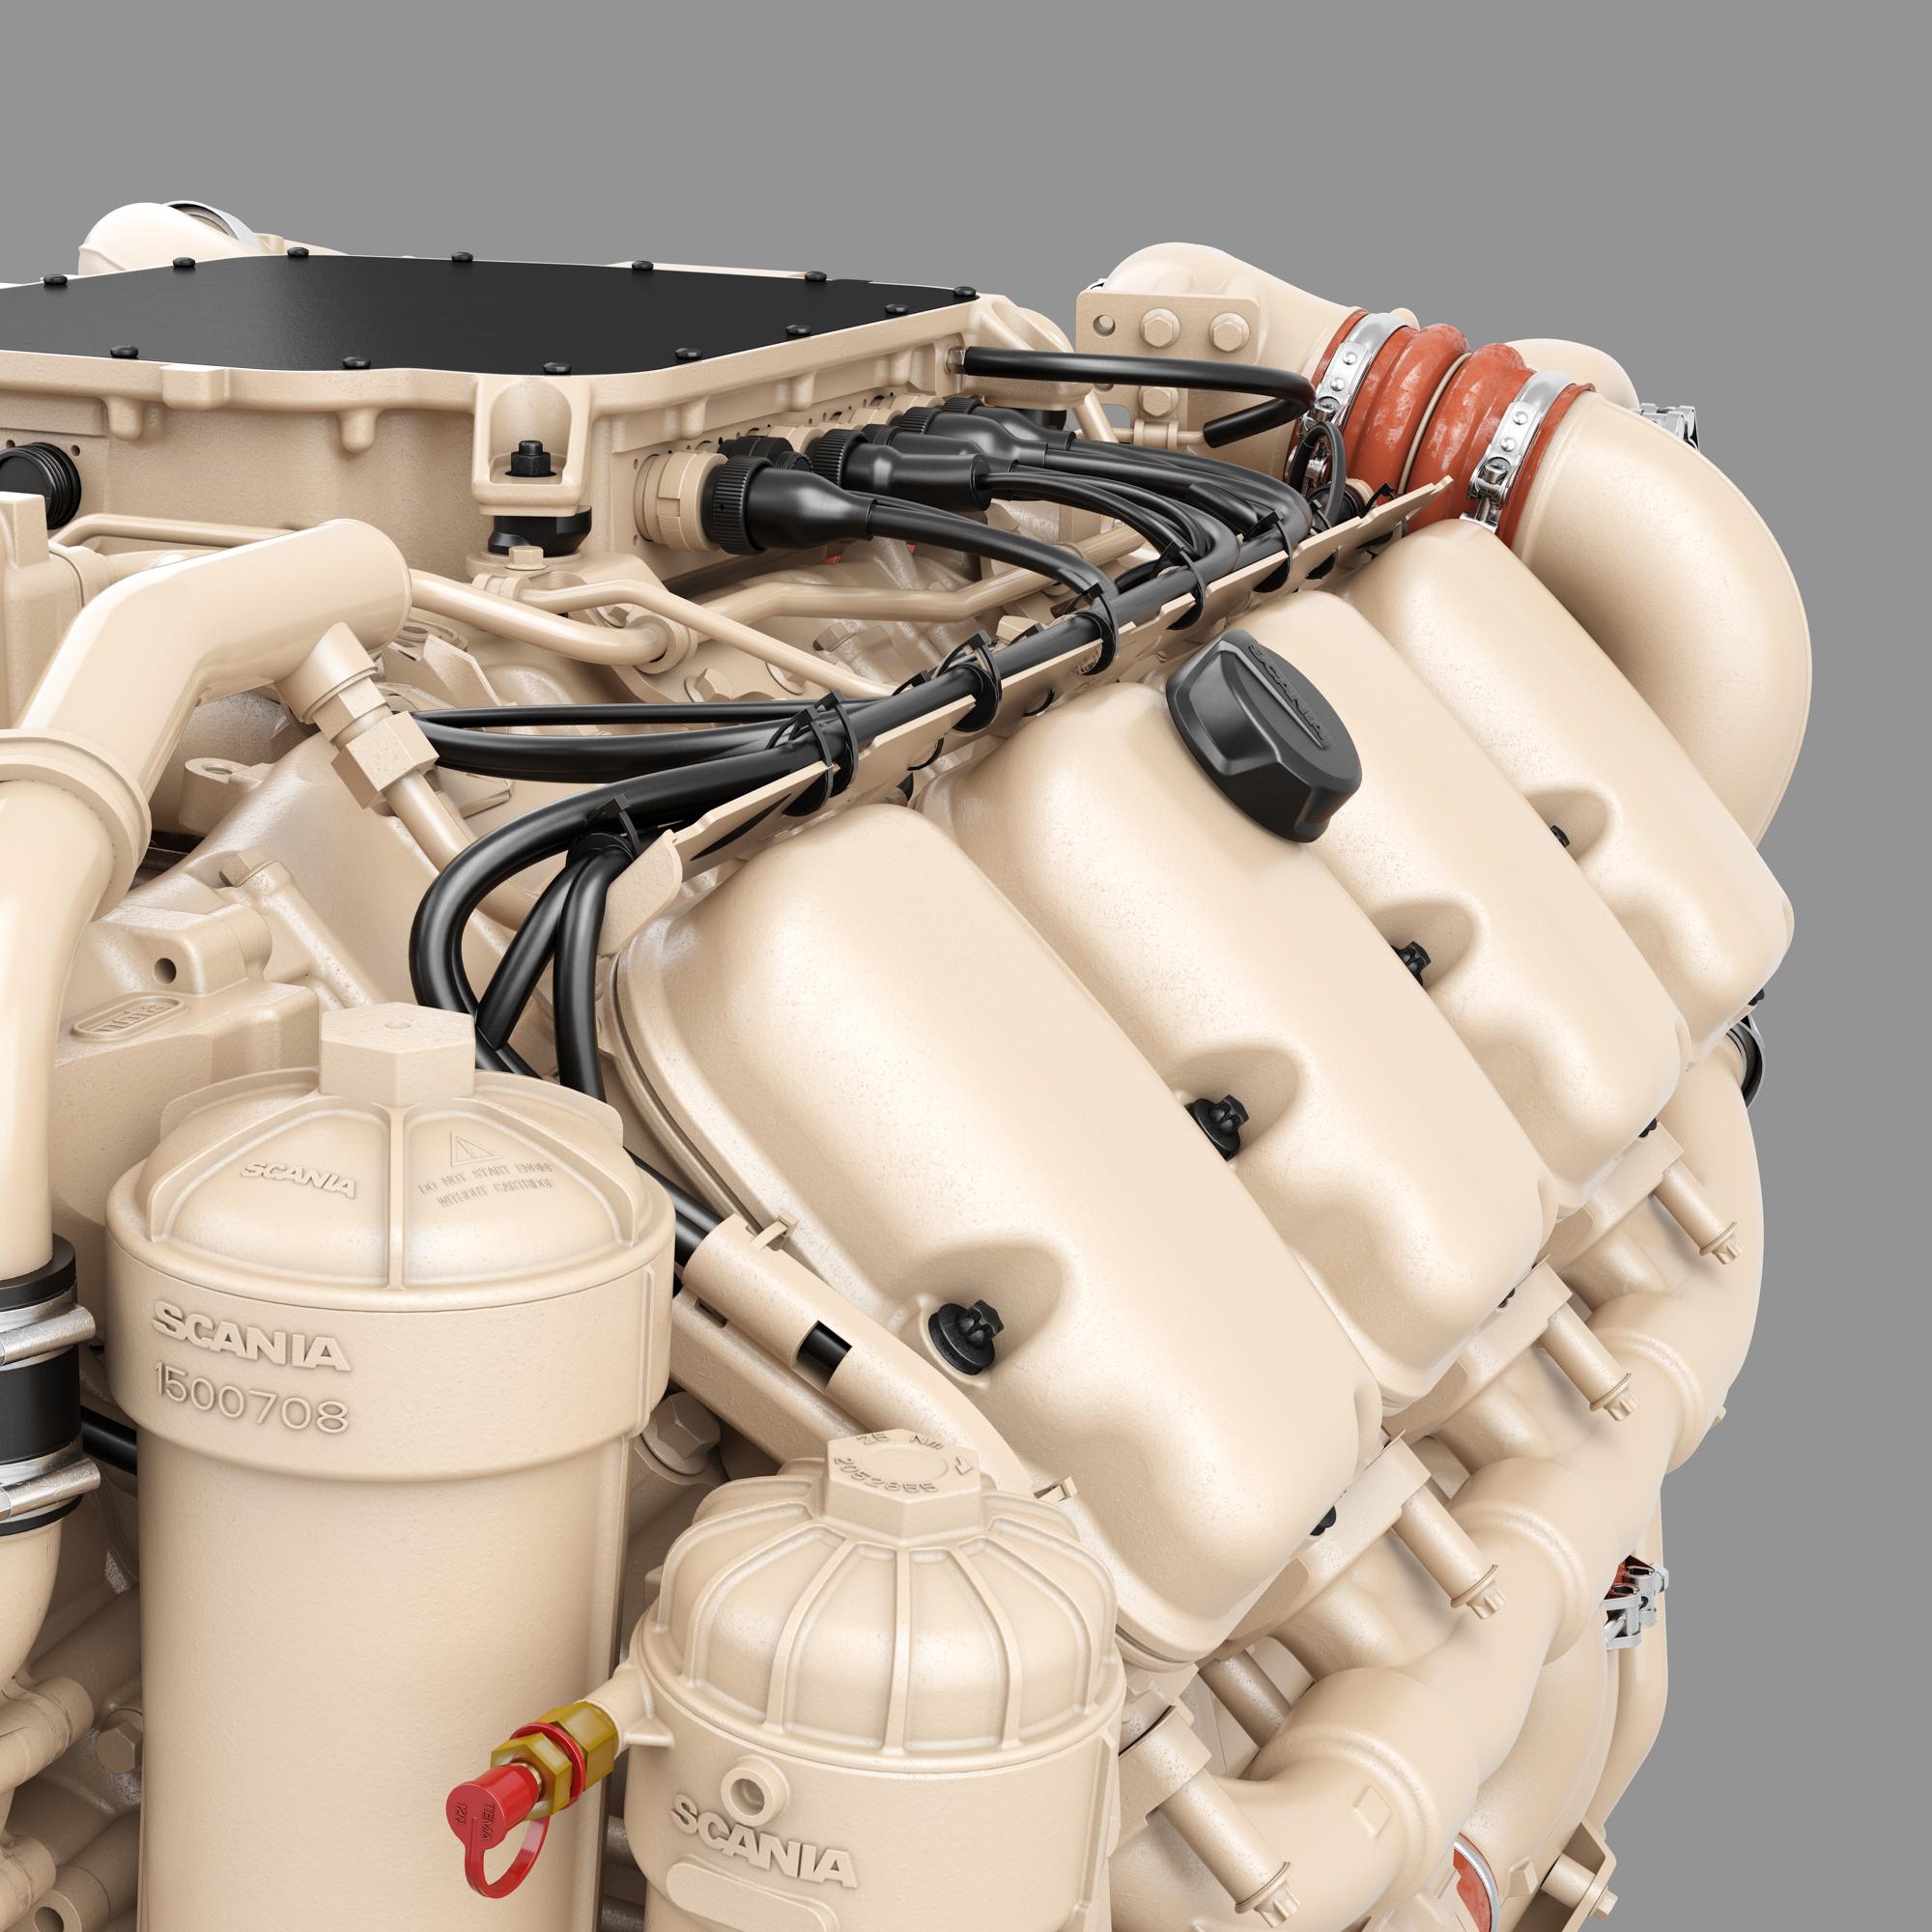 Scania_Engine_001.JPG